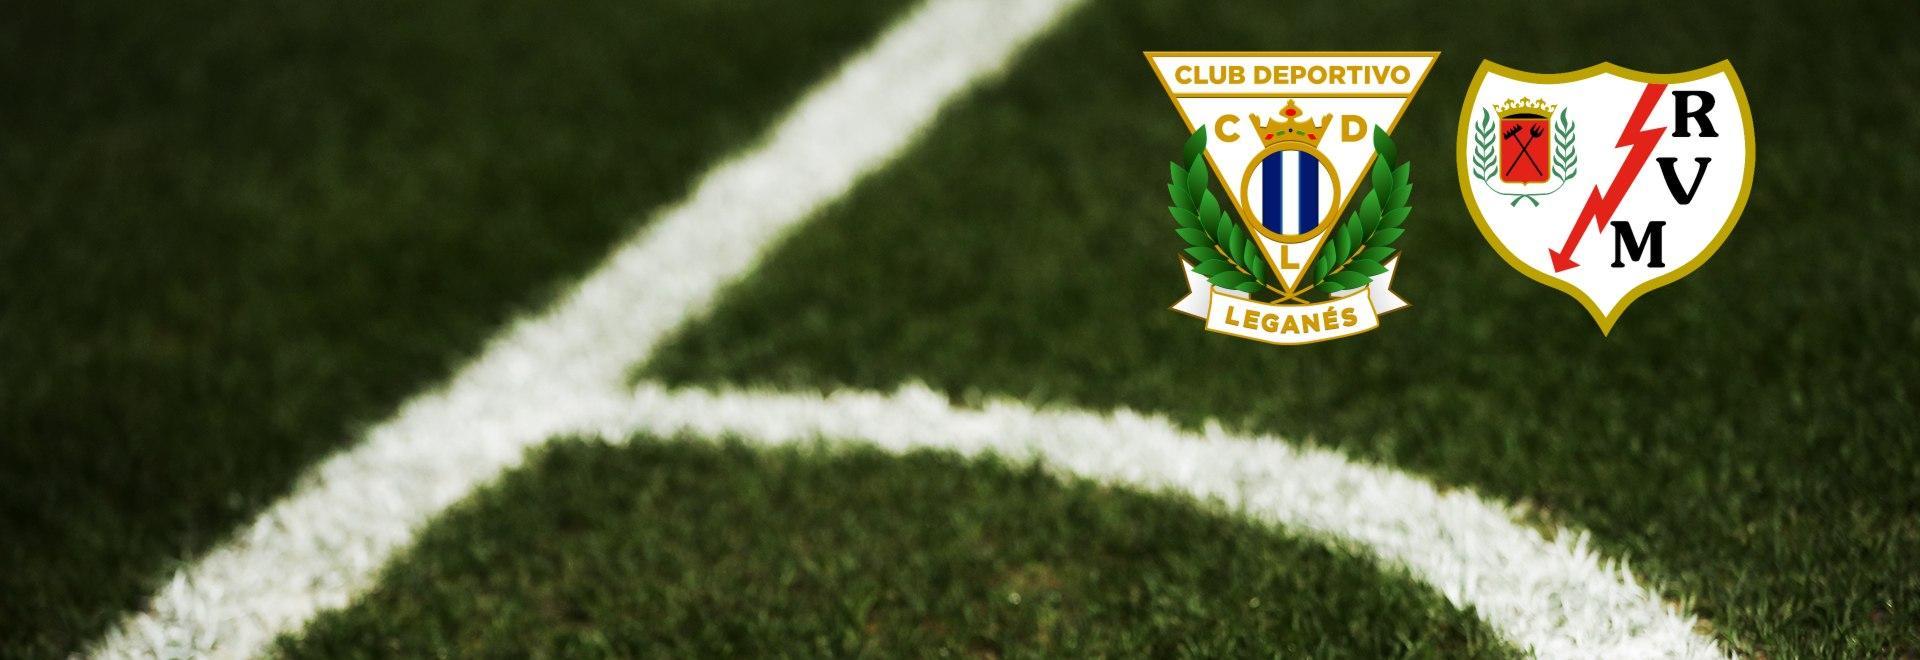 Leganes - Rayo Vallecano. Playoff 2a semifinale Ritorno